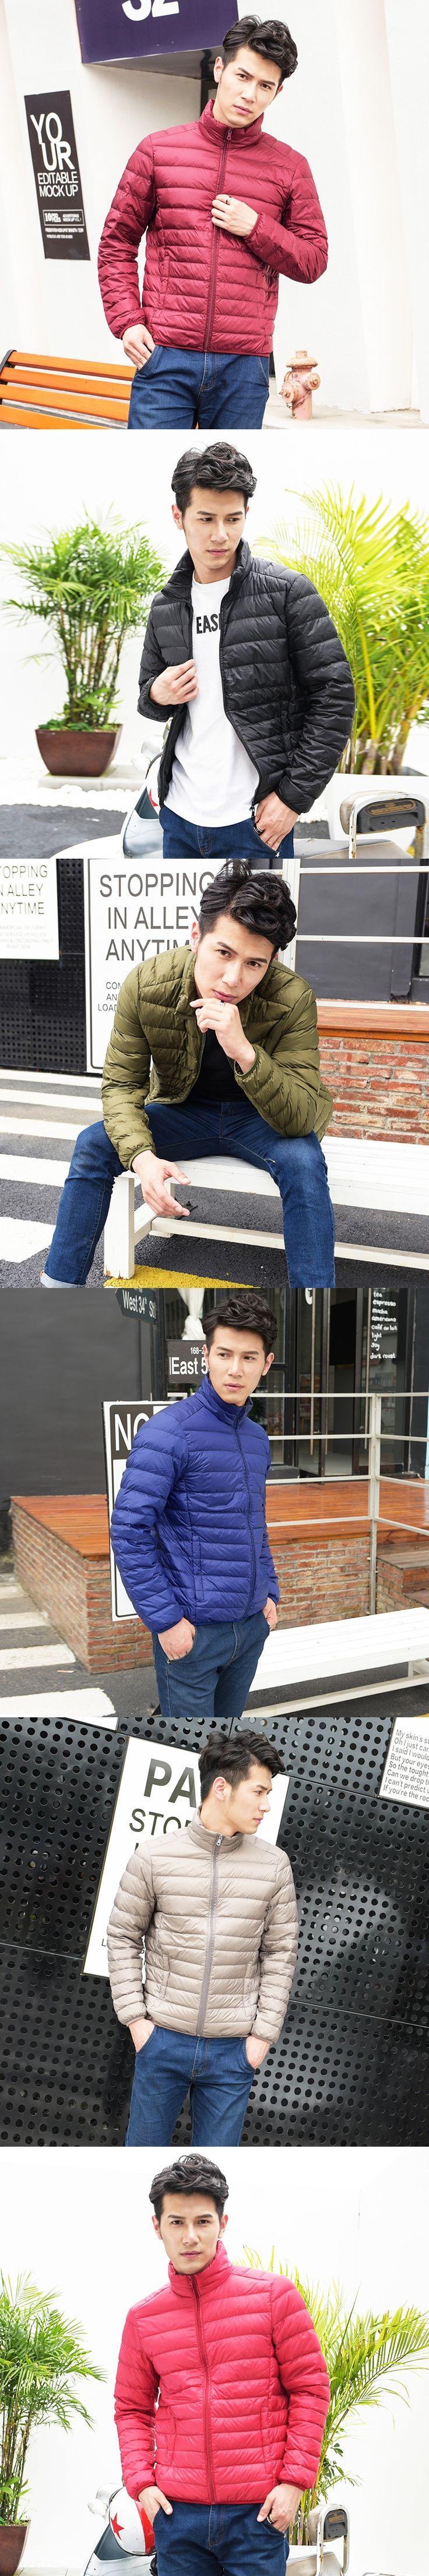 2016 hot sale winter jacket mens winter coat clothing warm short plus size soft jacket high quality